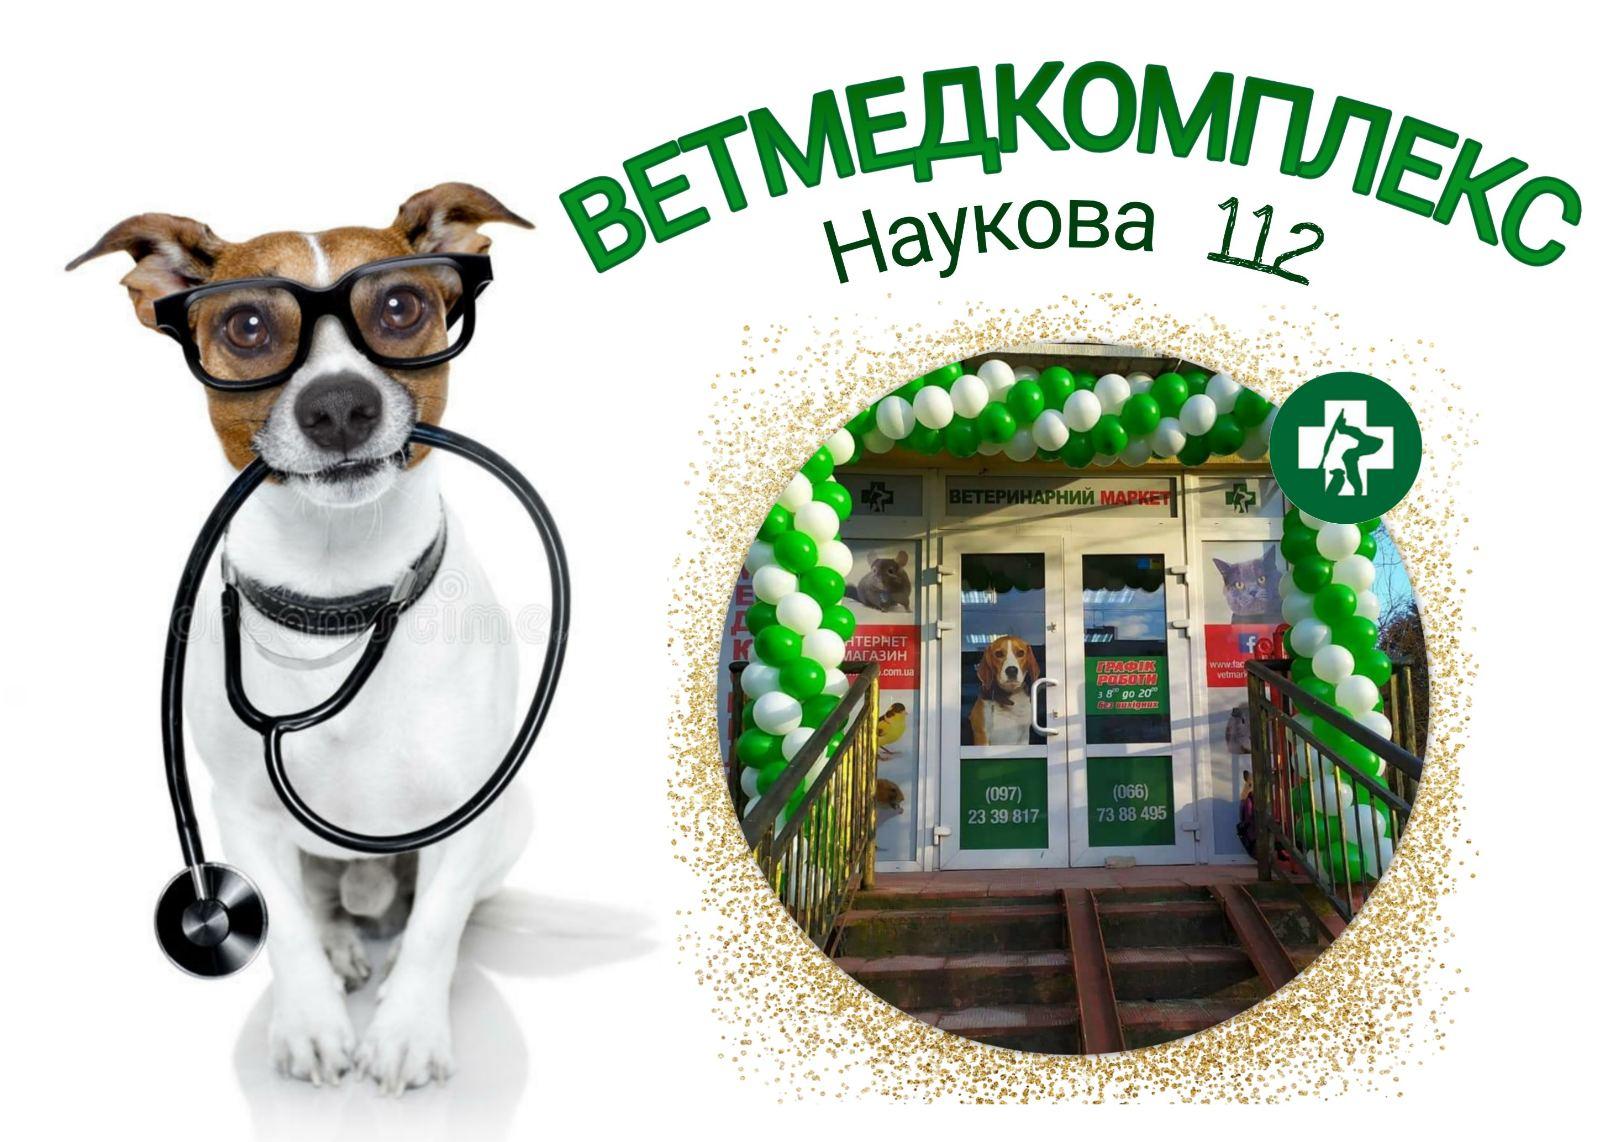 Ветеринарний кабінет Наукова